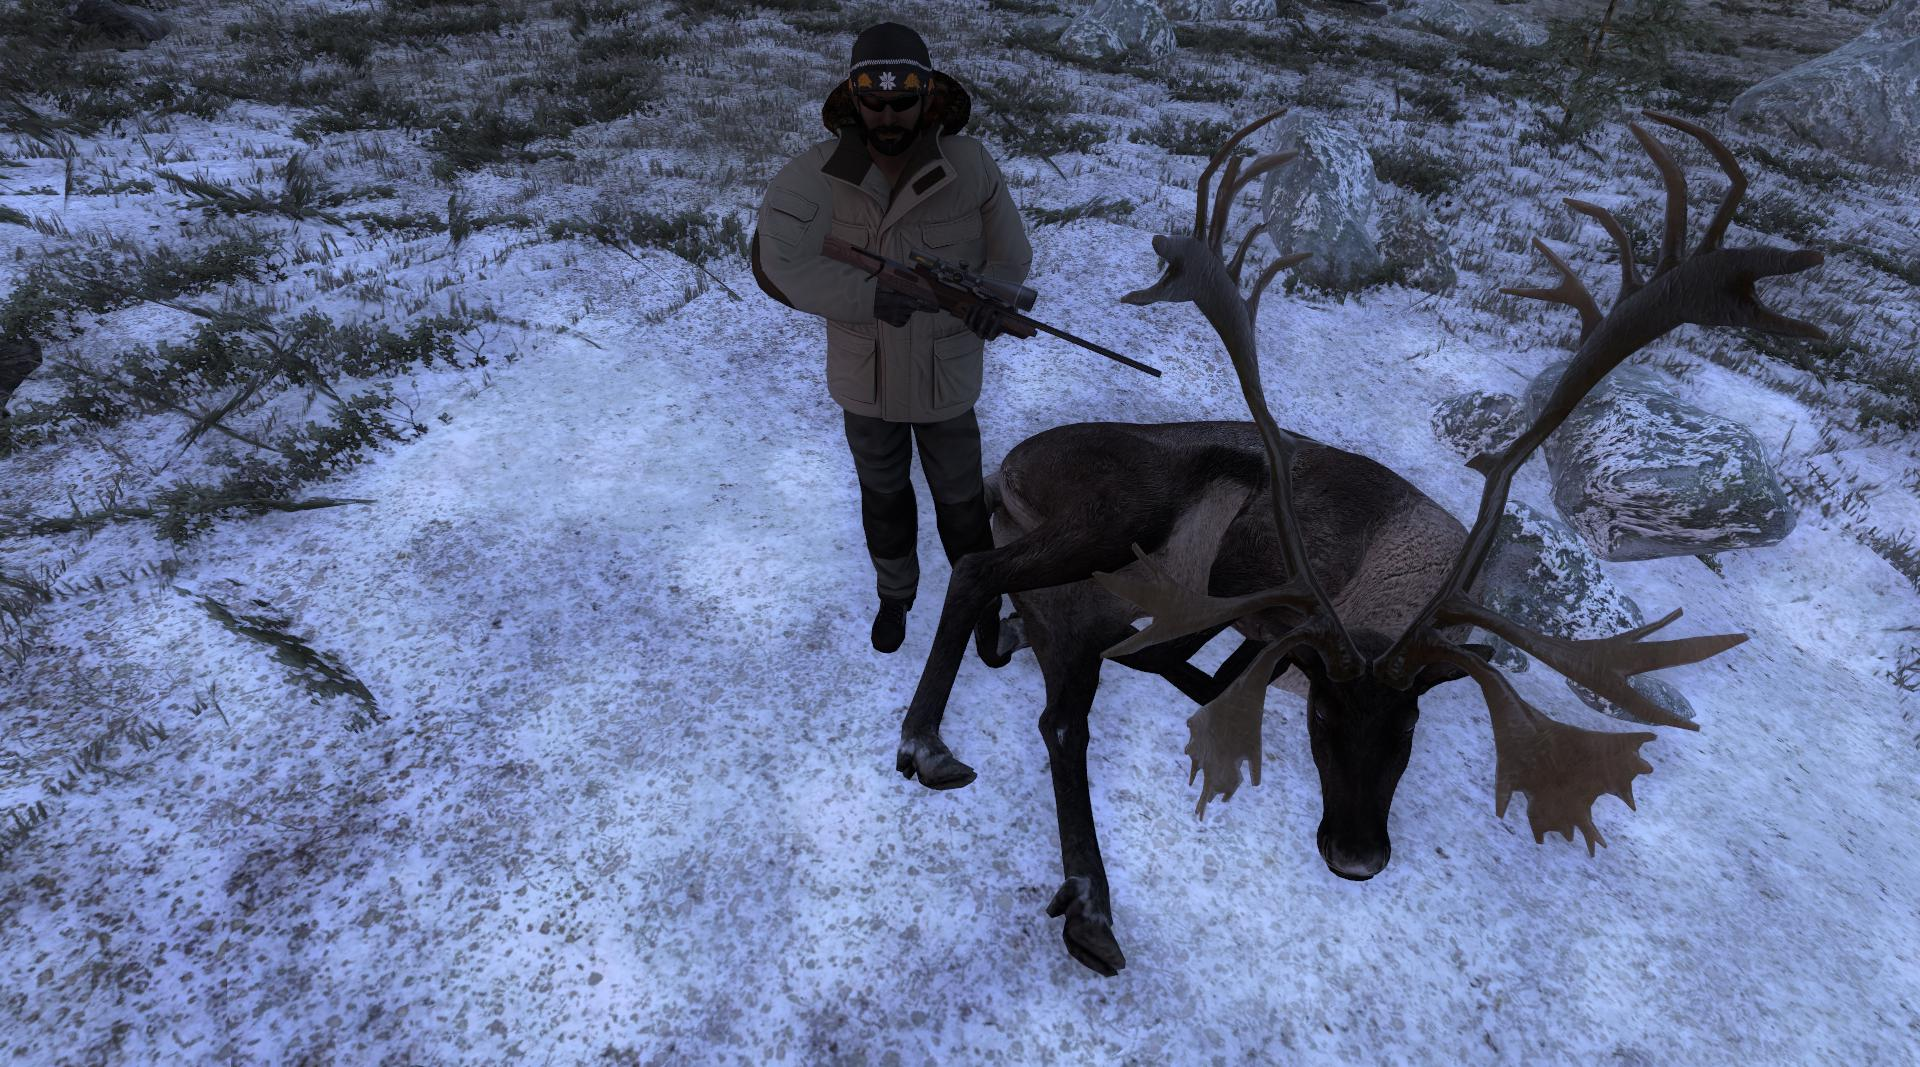 TOP 5 Reindeer // Reno Db4a4ff15ebac4e5cb17cdf30d14d70f1cde224f